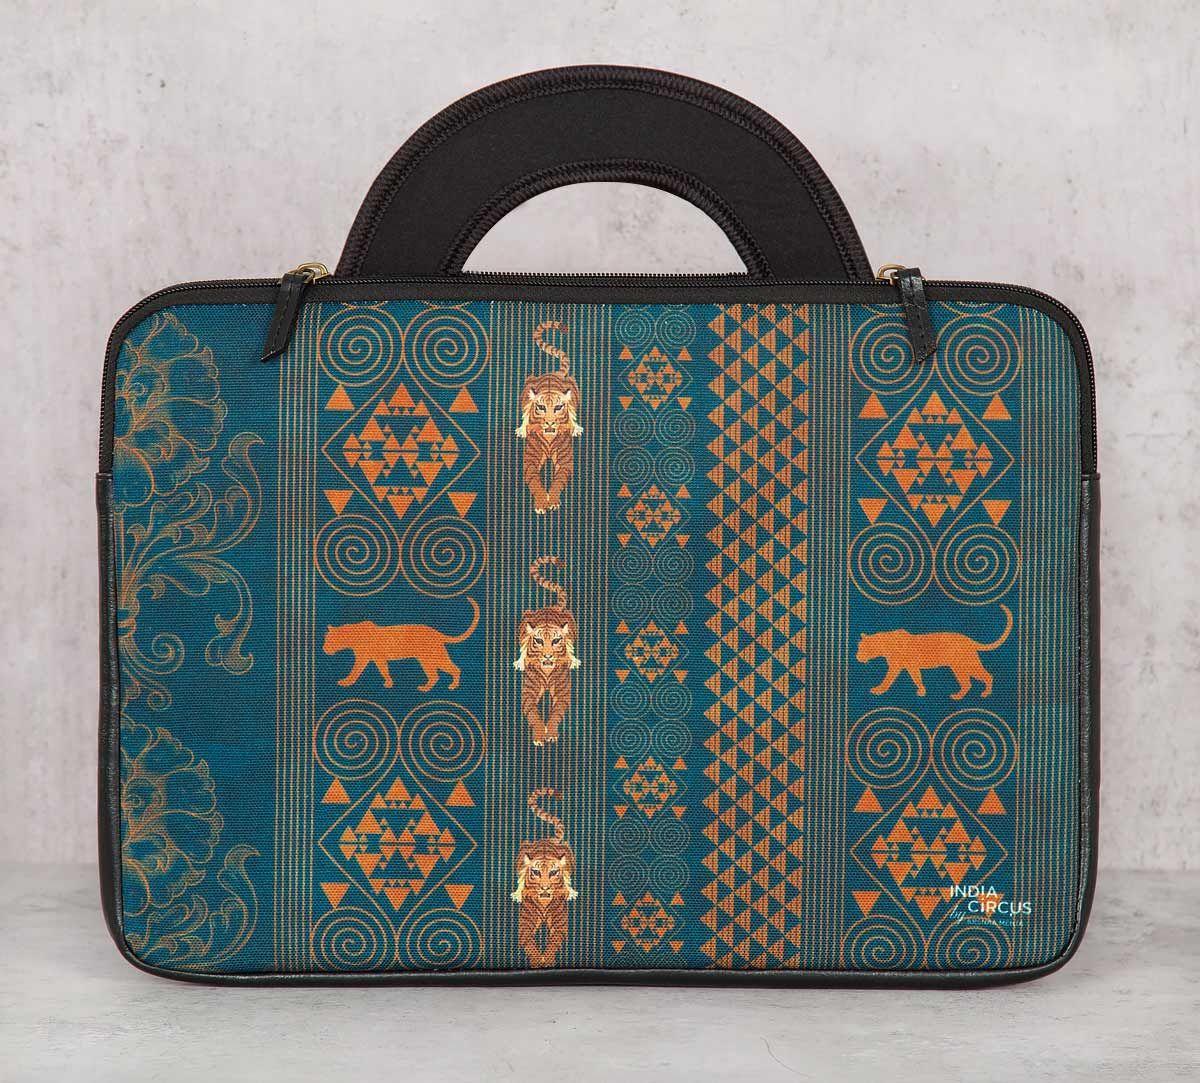 India Circus Geometrical Empress Blue 13-inch Laptop Bag